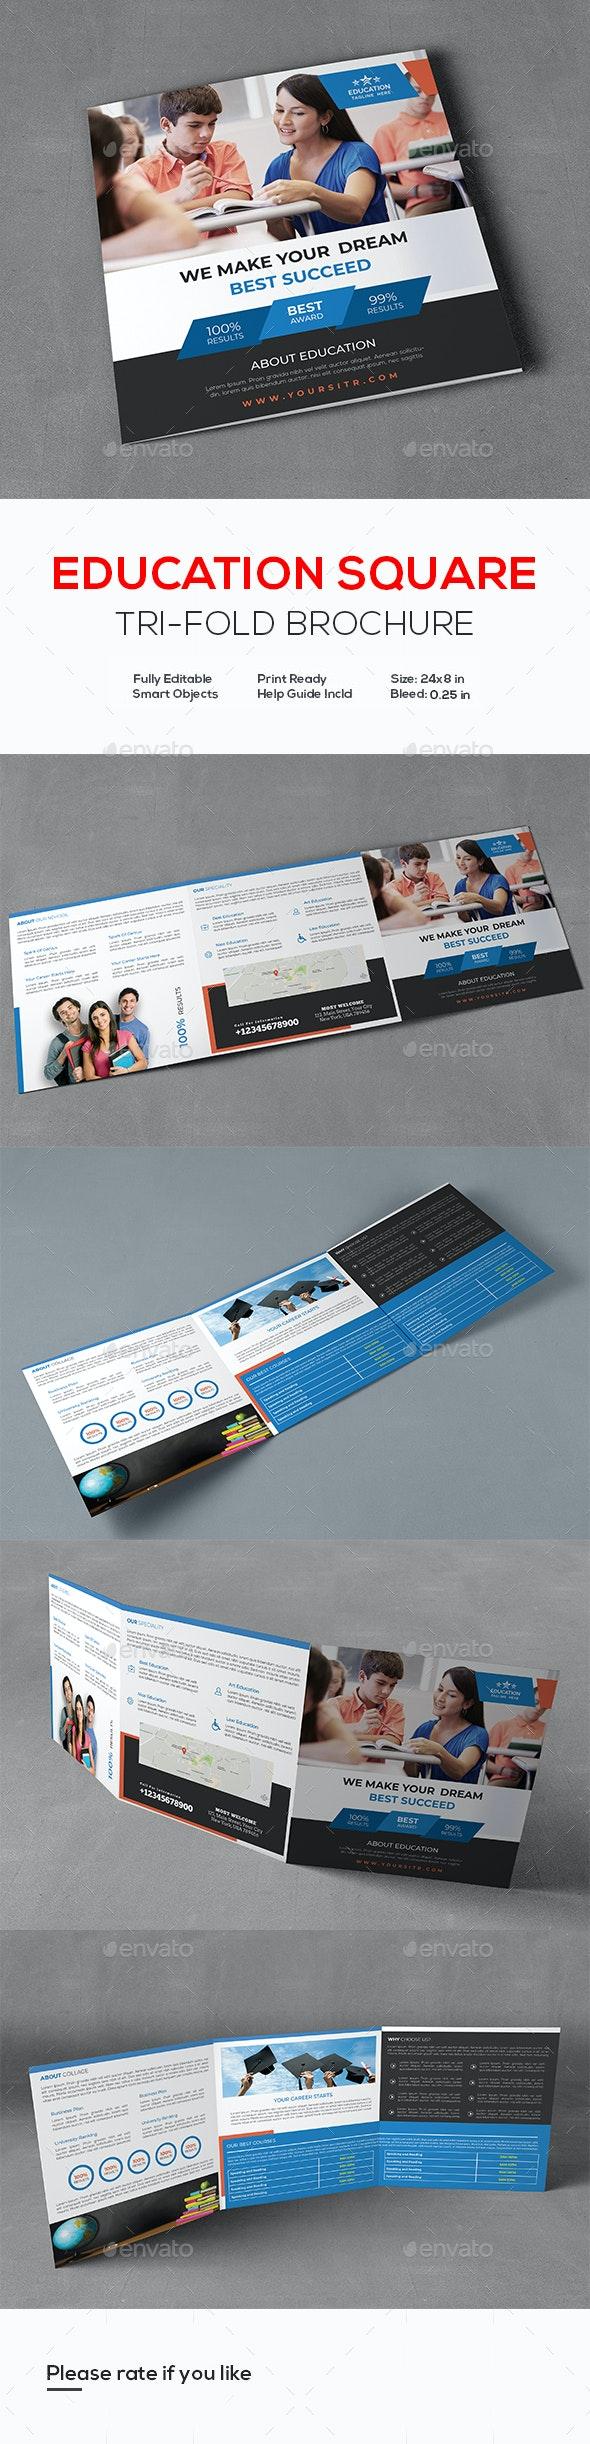 Education Square Trifold Prospectus Brochure - Corporate Brochures